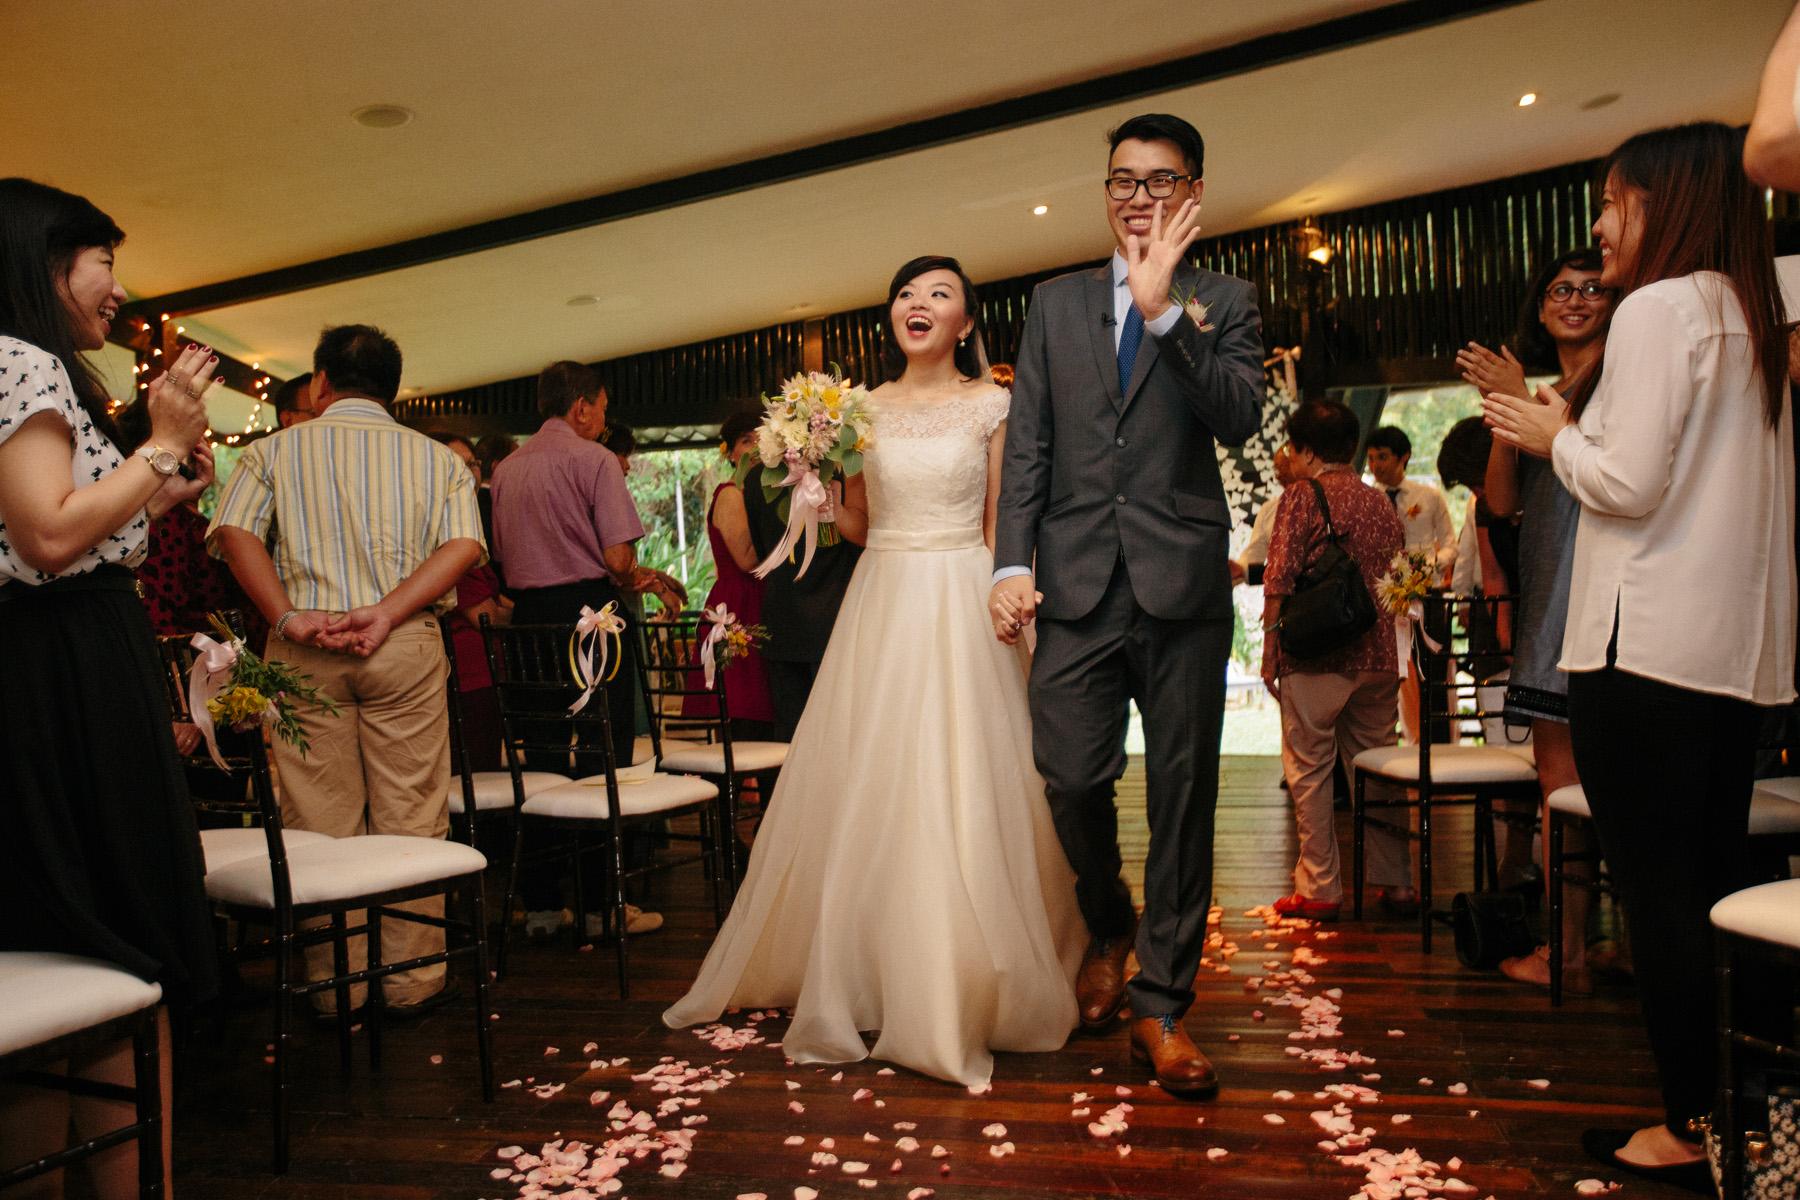 singapore-wedding-travel-photographer-faith-alvin-wedding-wmt-43.jpg